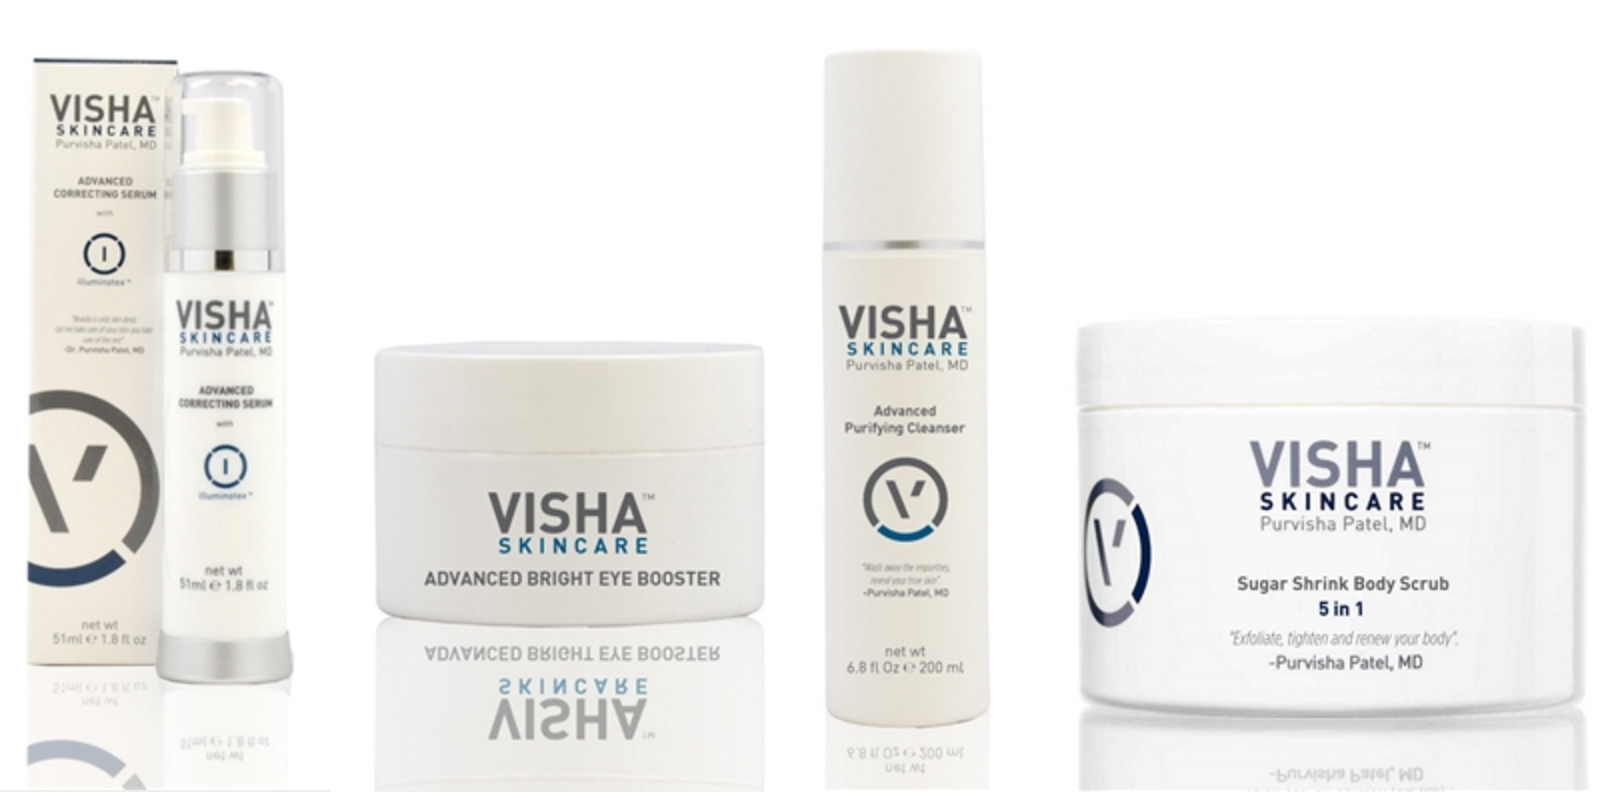 shop.vishaskincare.com